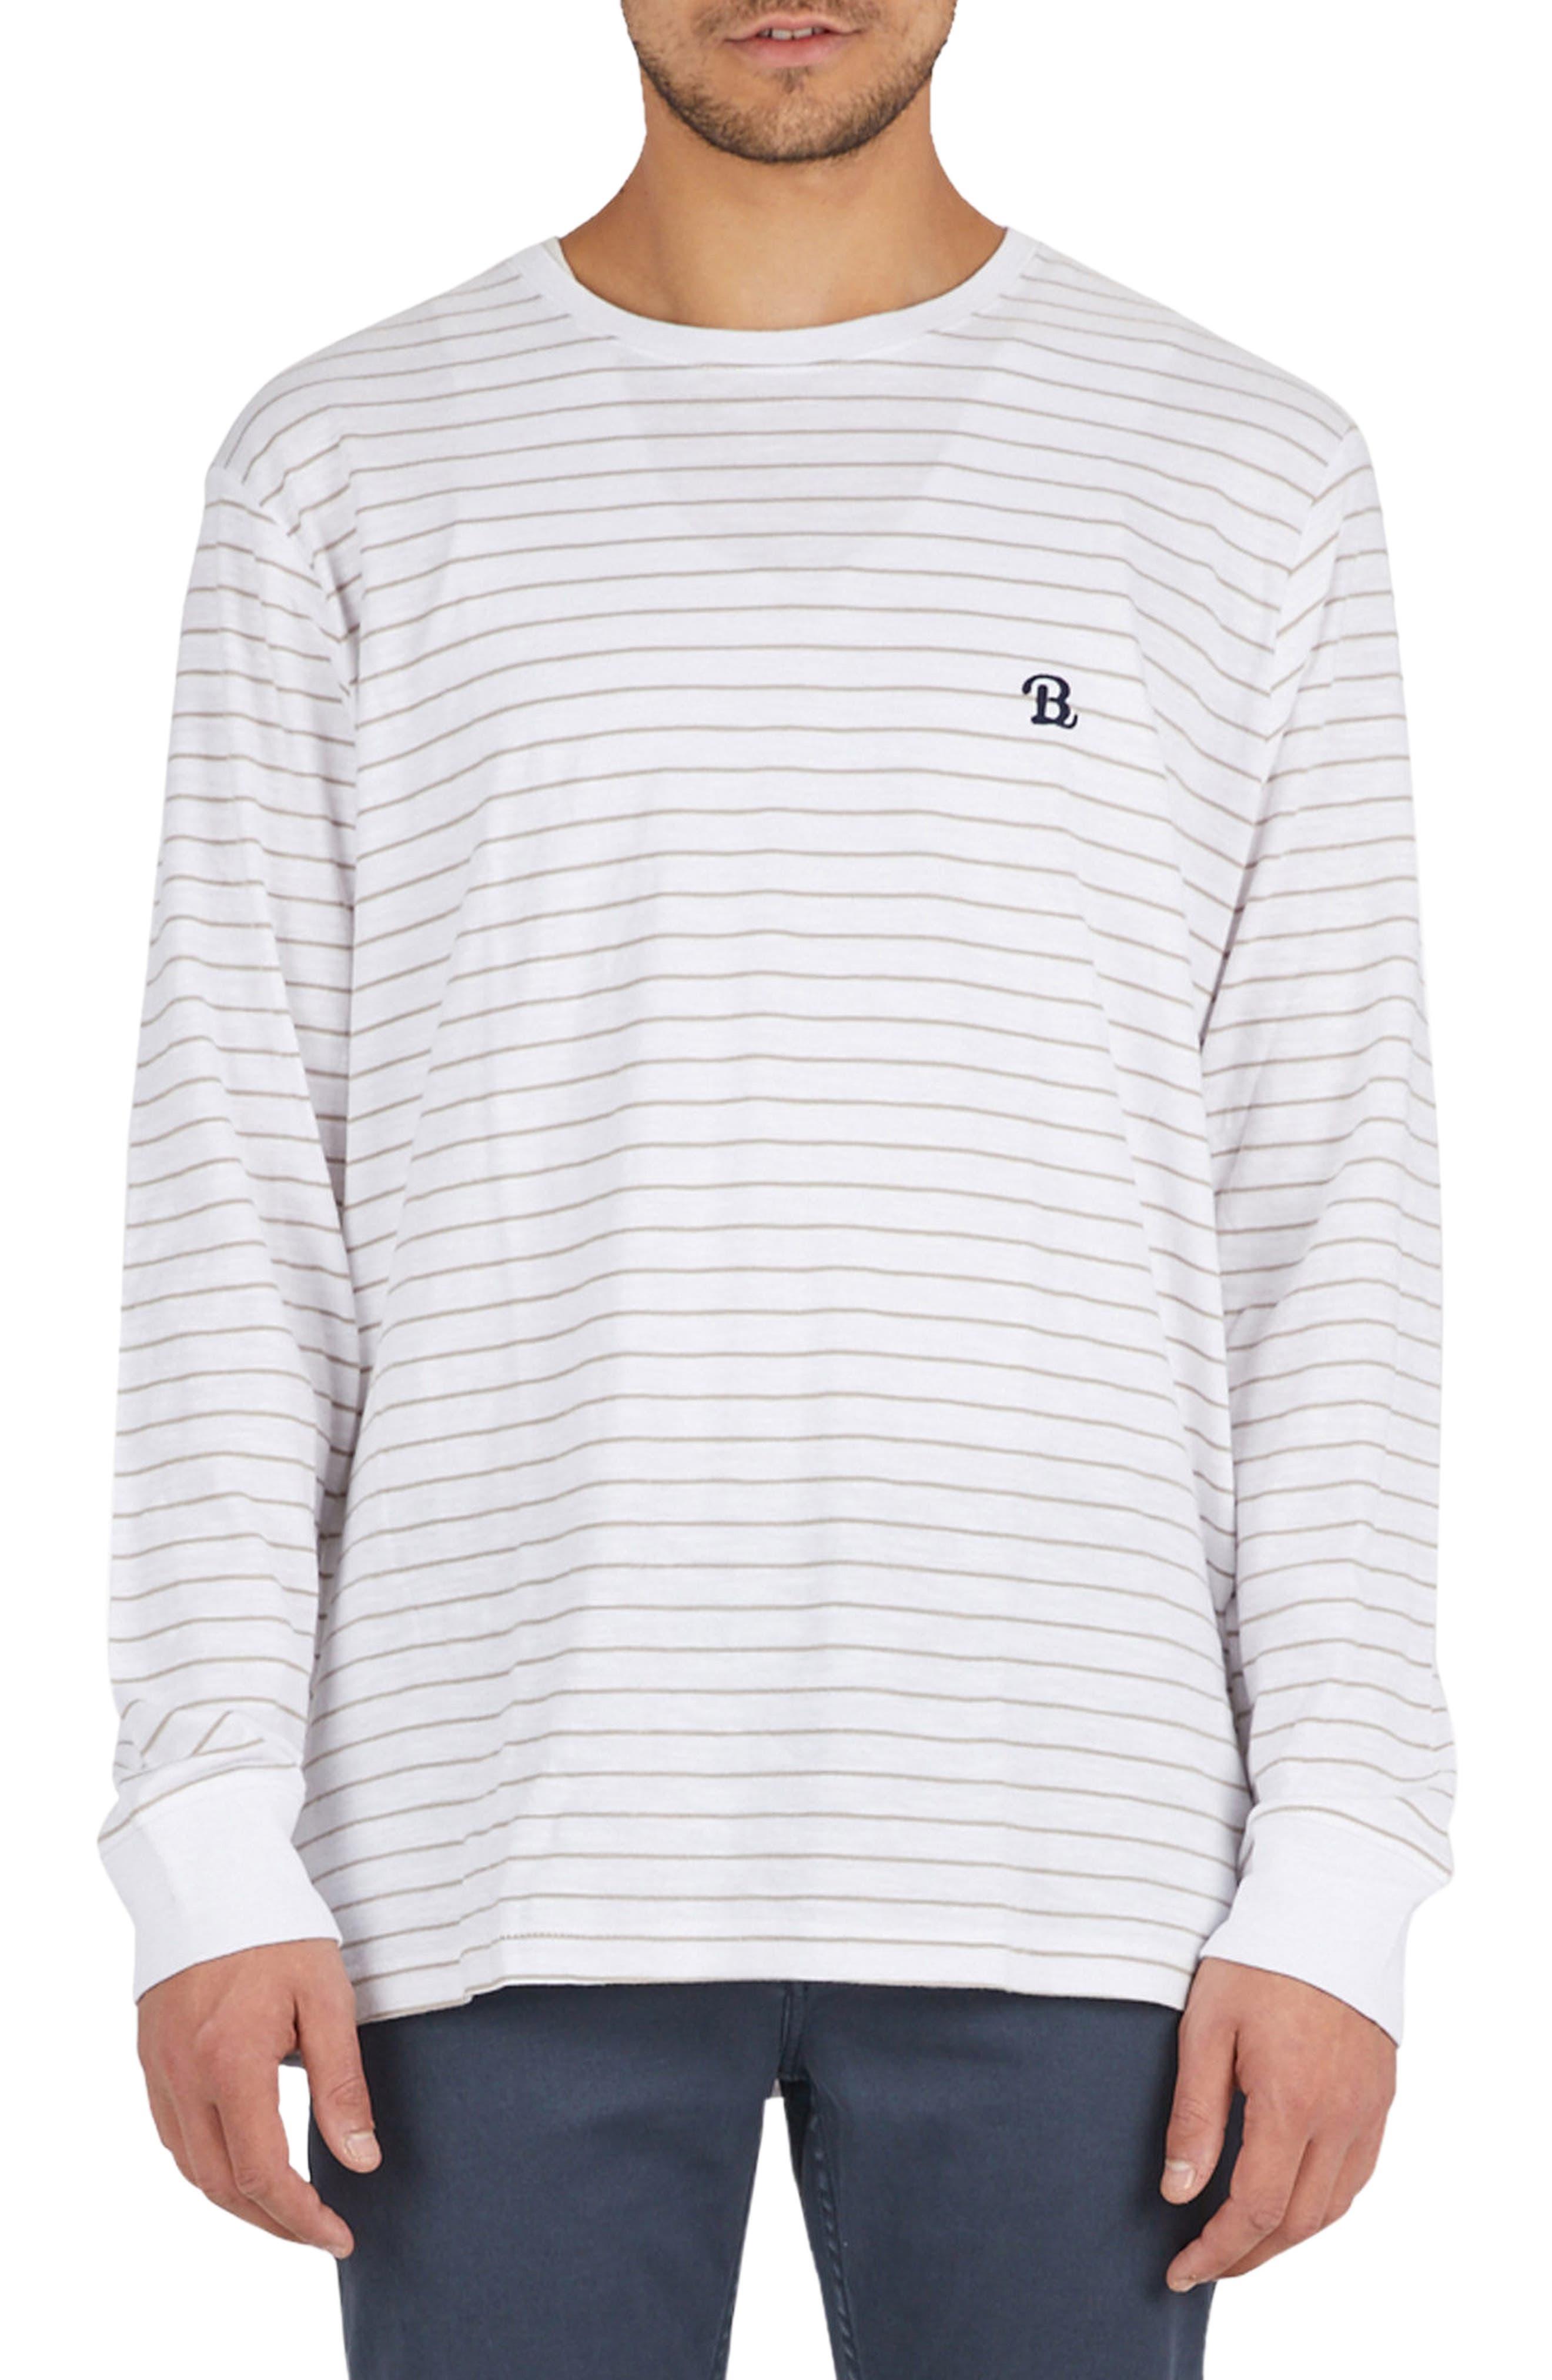 B. Schooled T-Shirt,                         Main,                         color, Beige Stripe